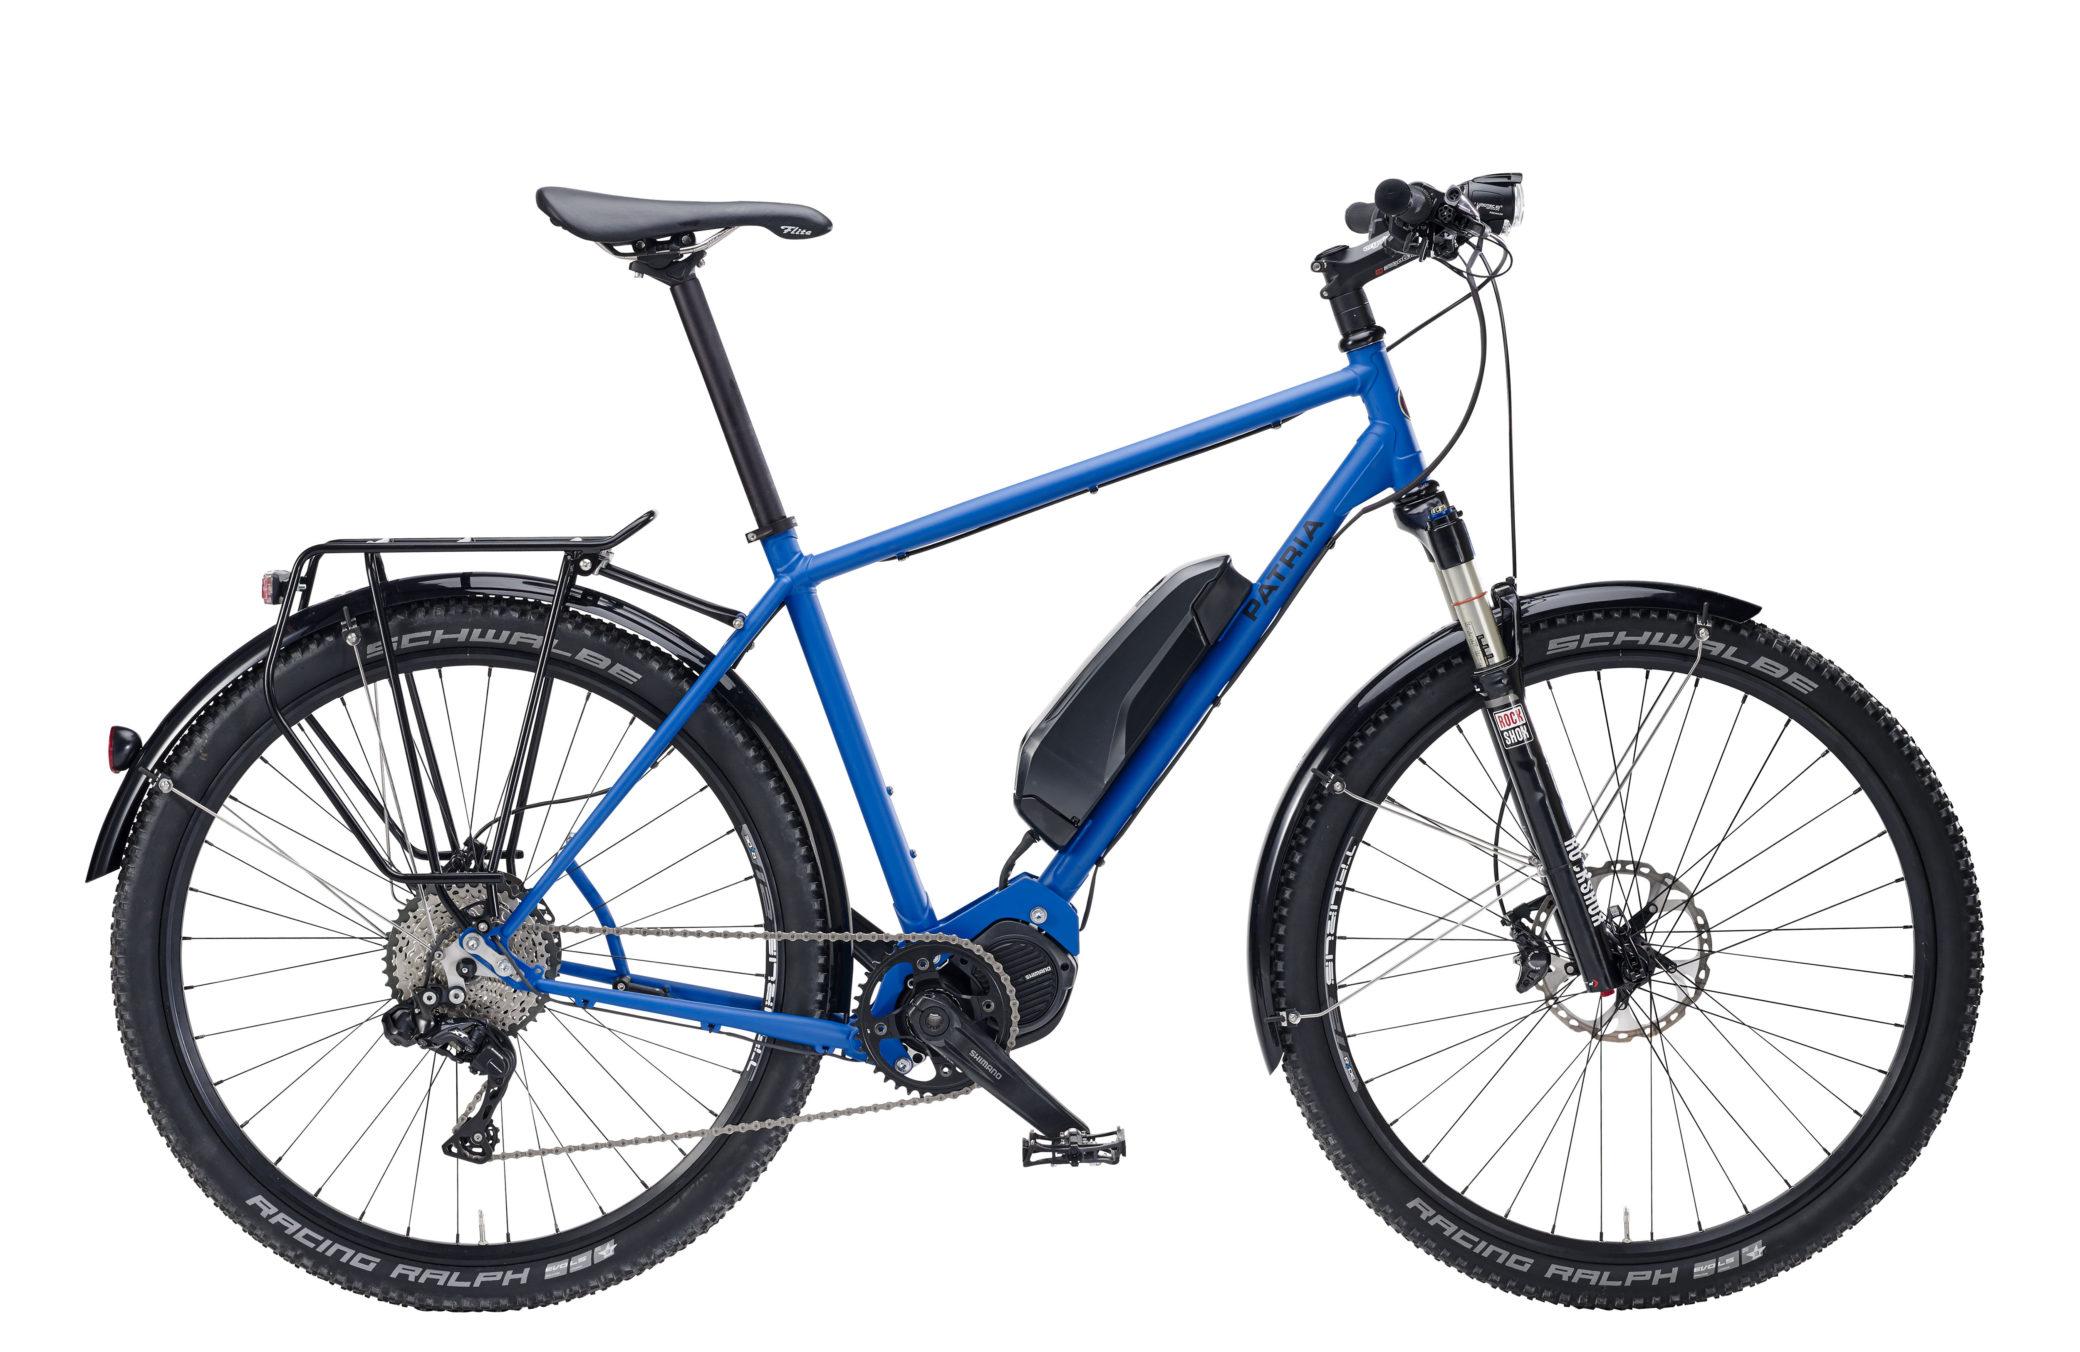 Graveller Road Hybrid, XT Di2 11-Gang, Sonderausstattung: Rahmenfarbe RAL 5010 Enzianblau matt